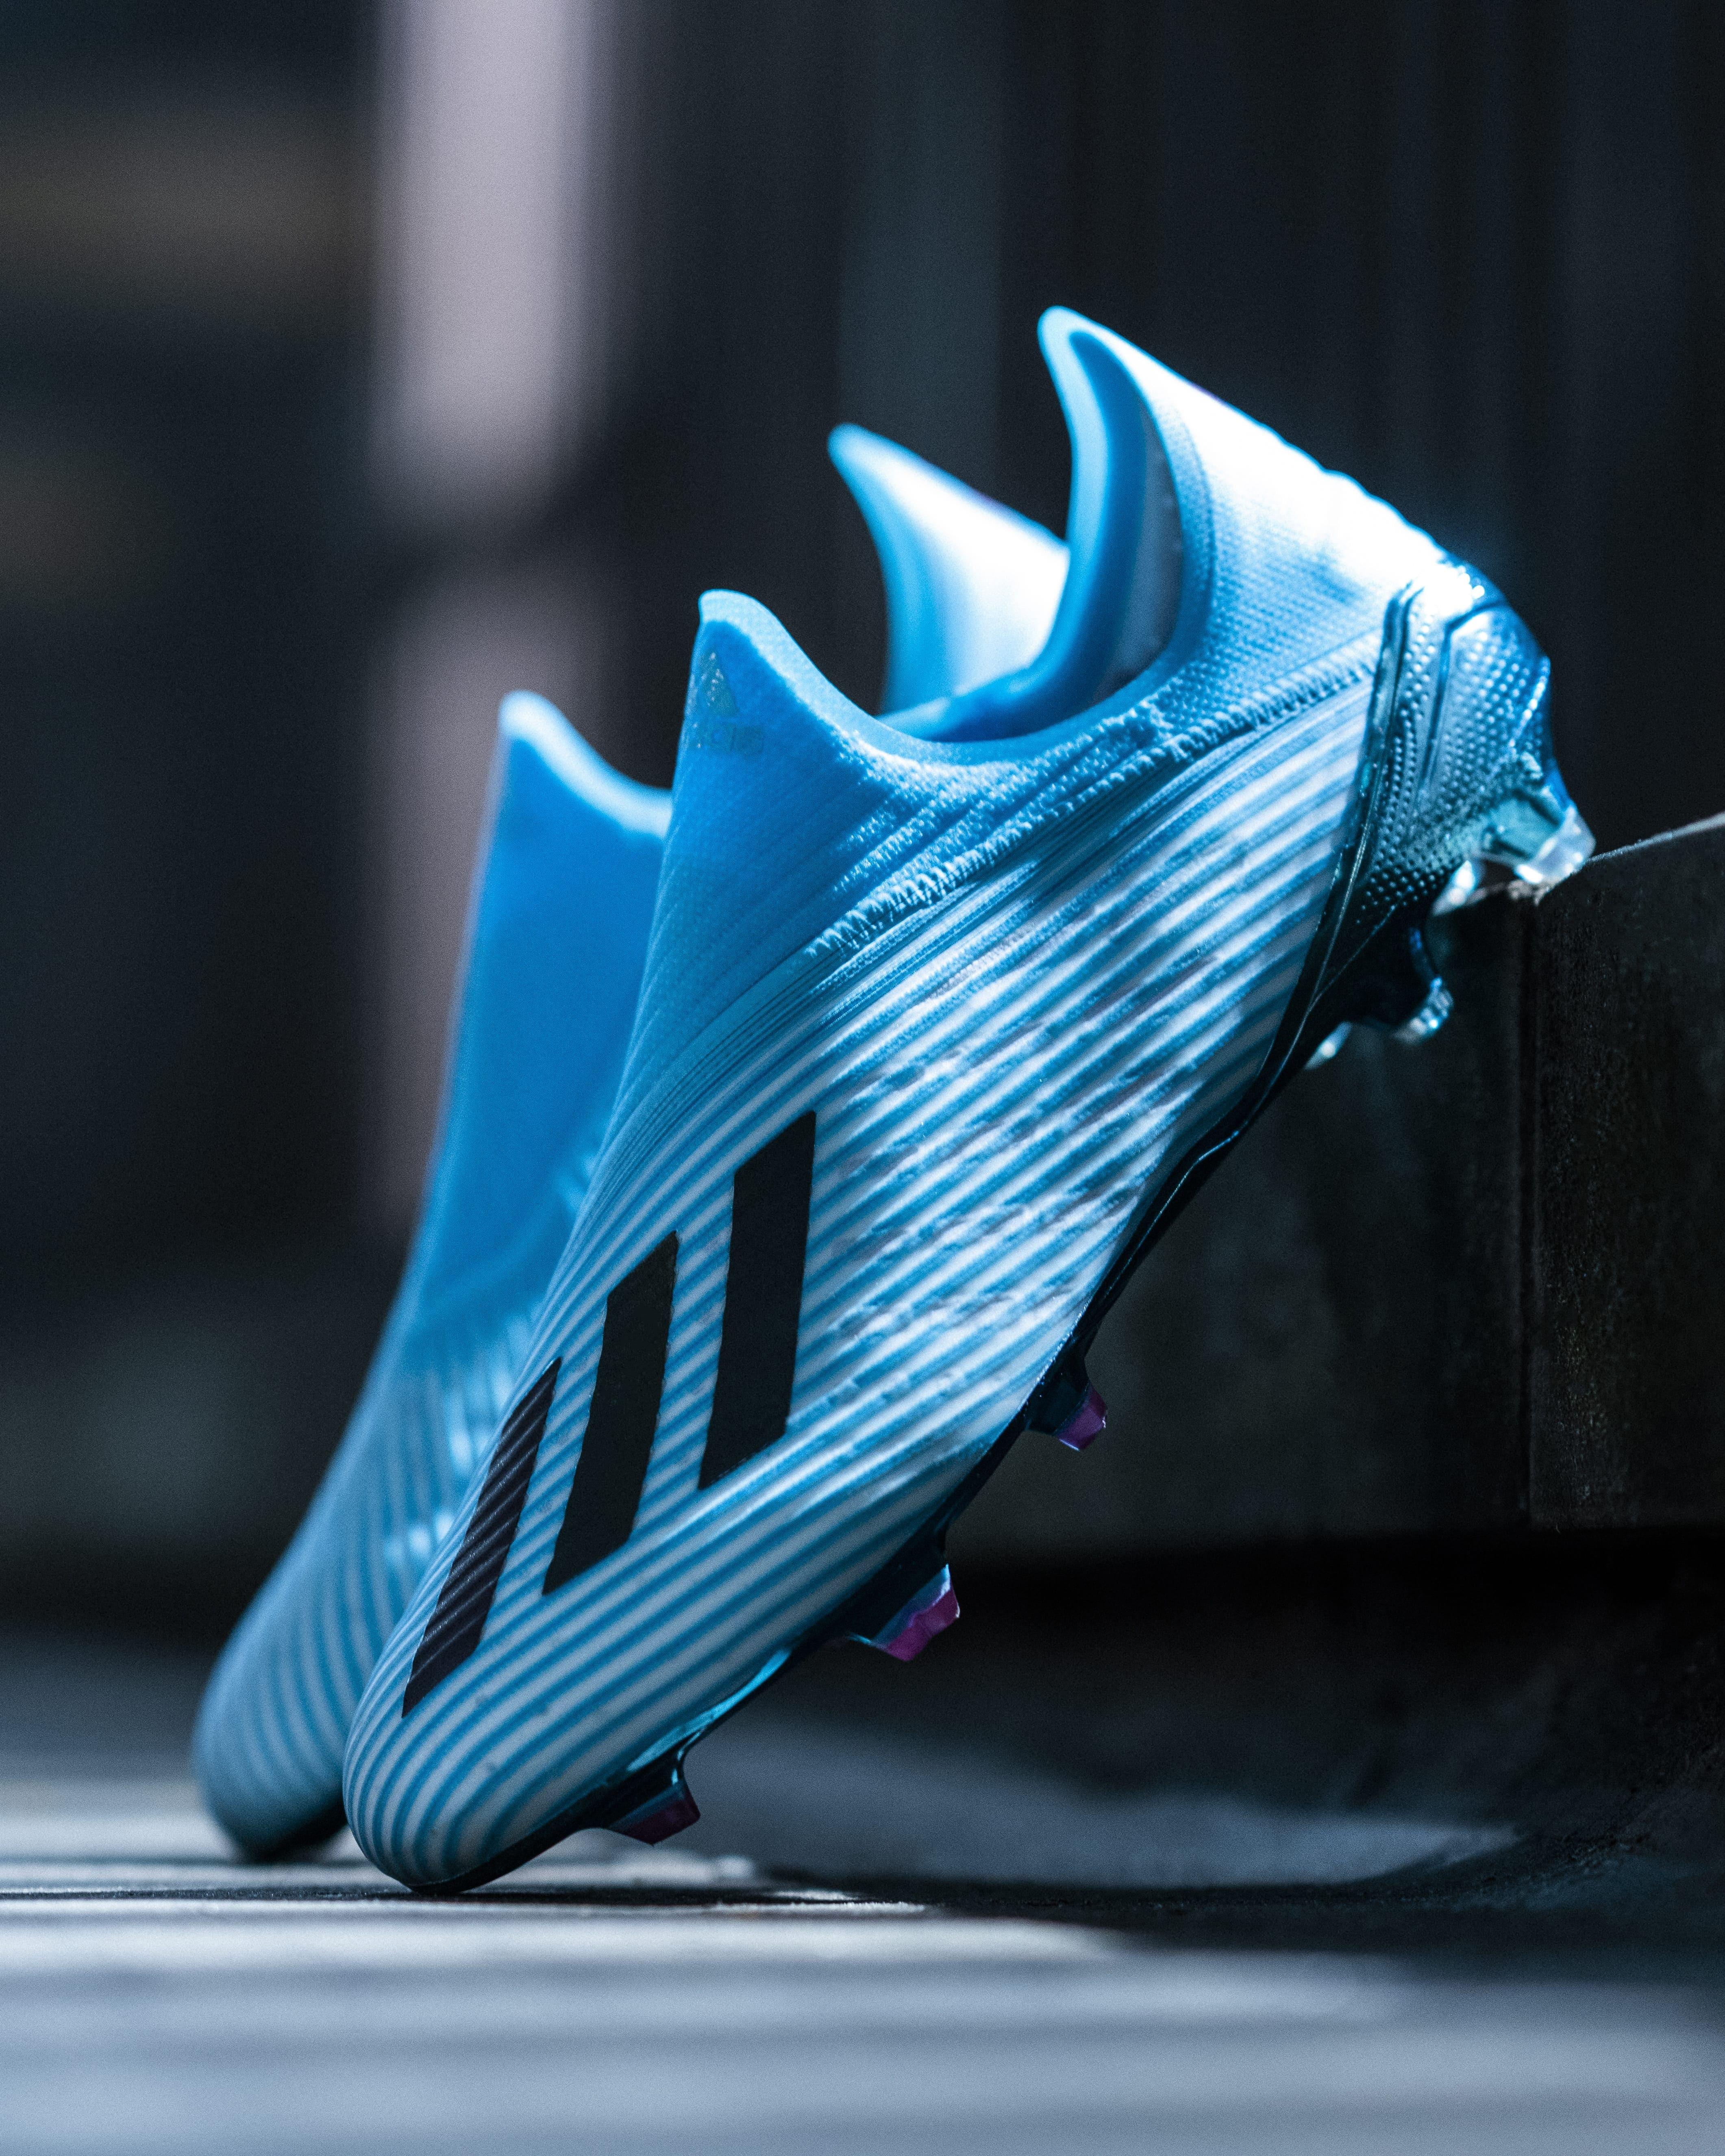 Ecco le nuove scarpe di Dybala e Messi | Foto Sportmediaset